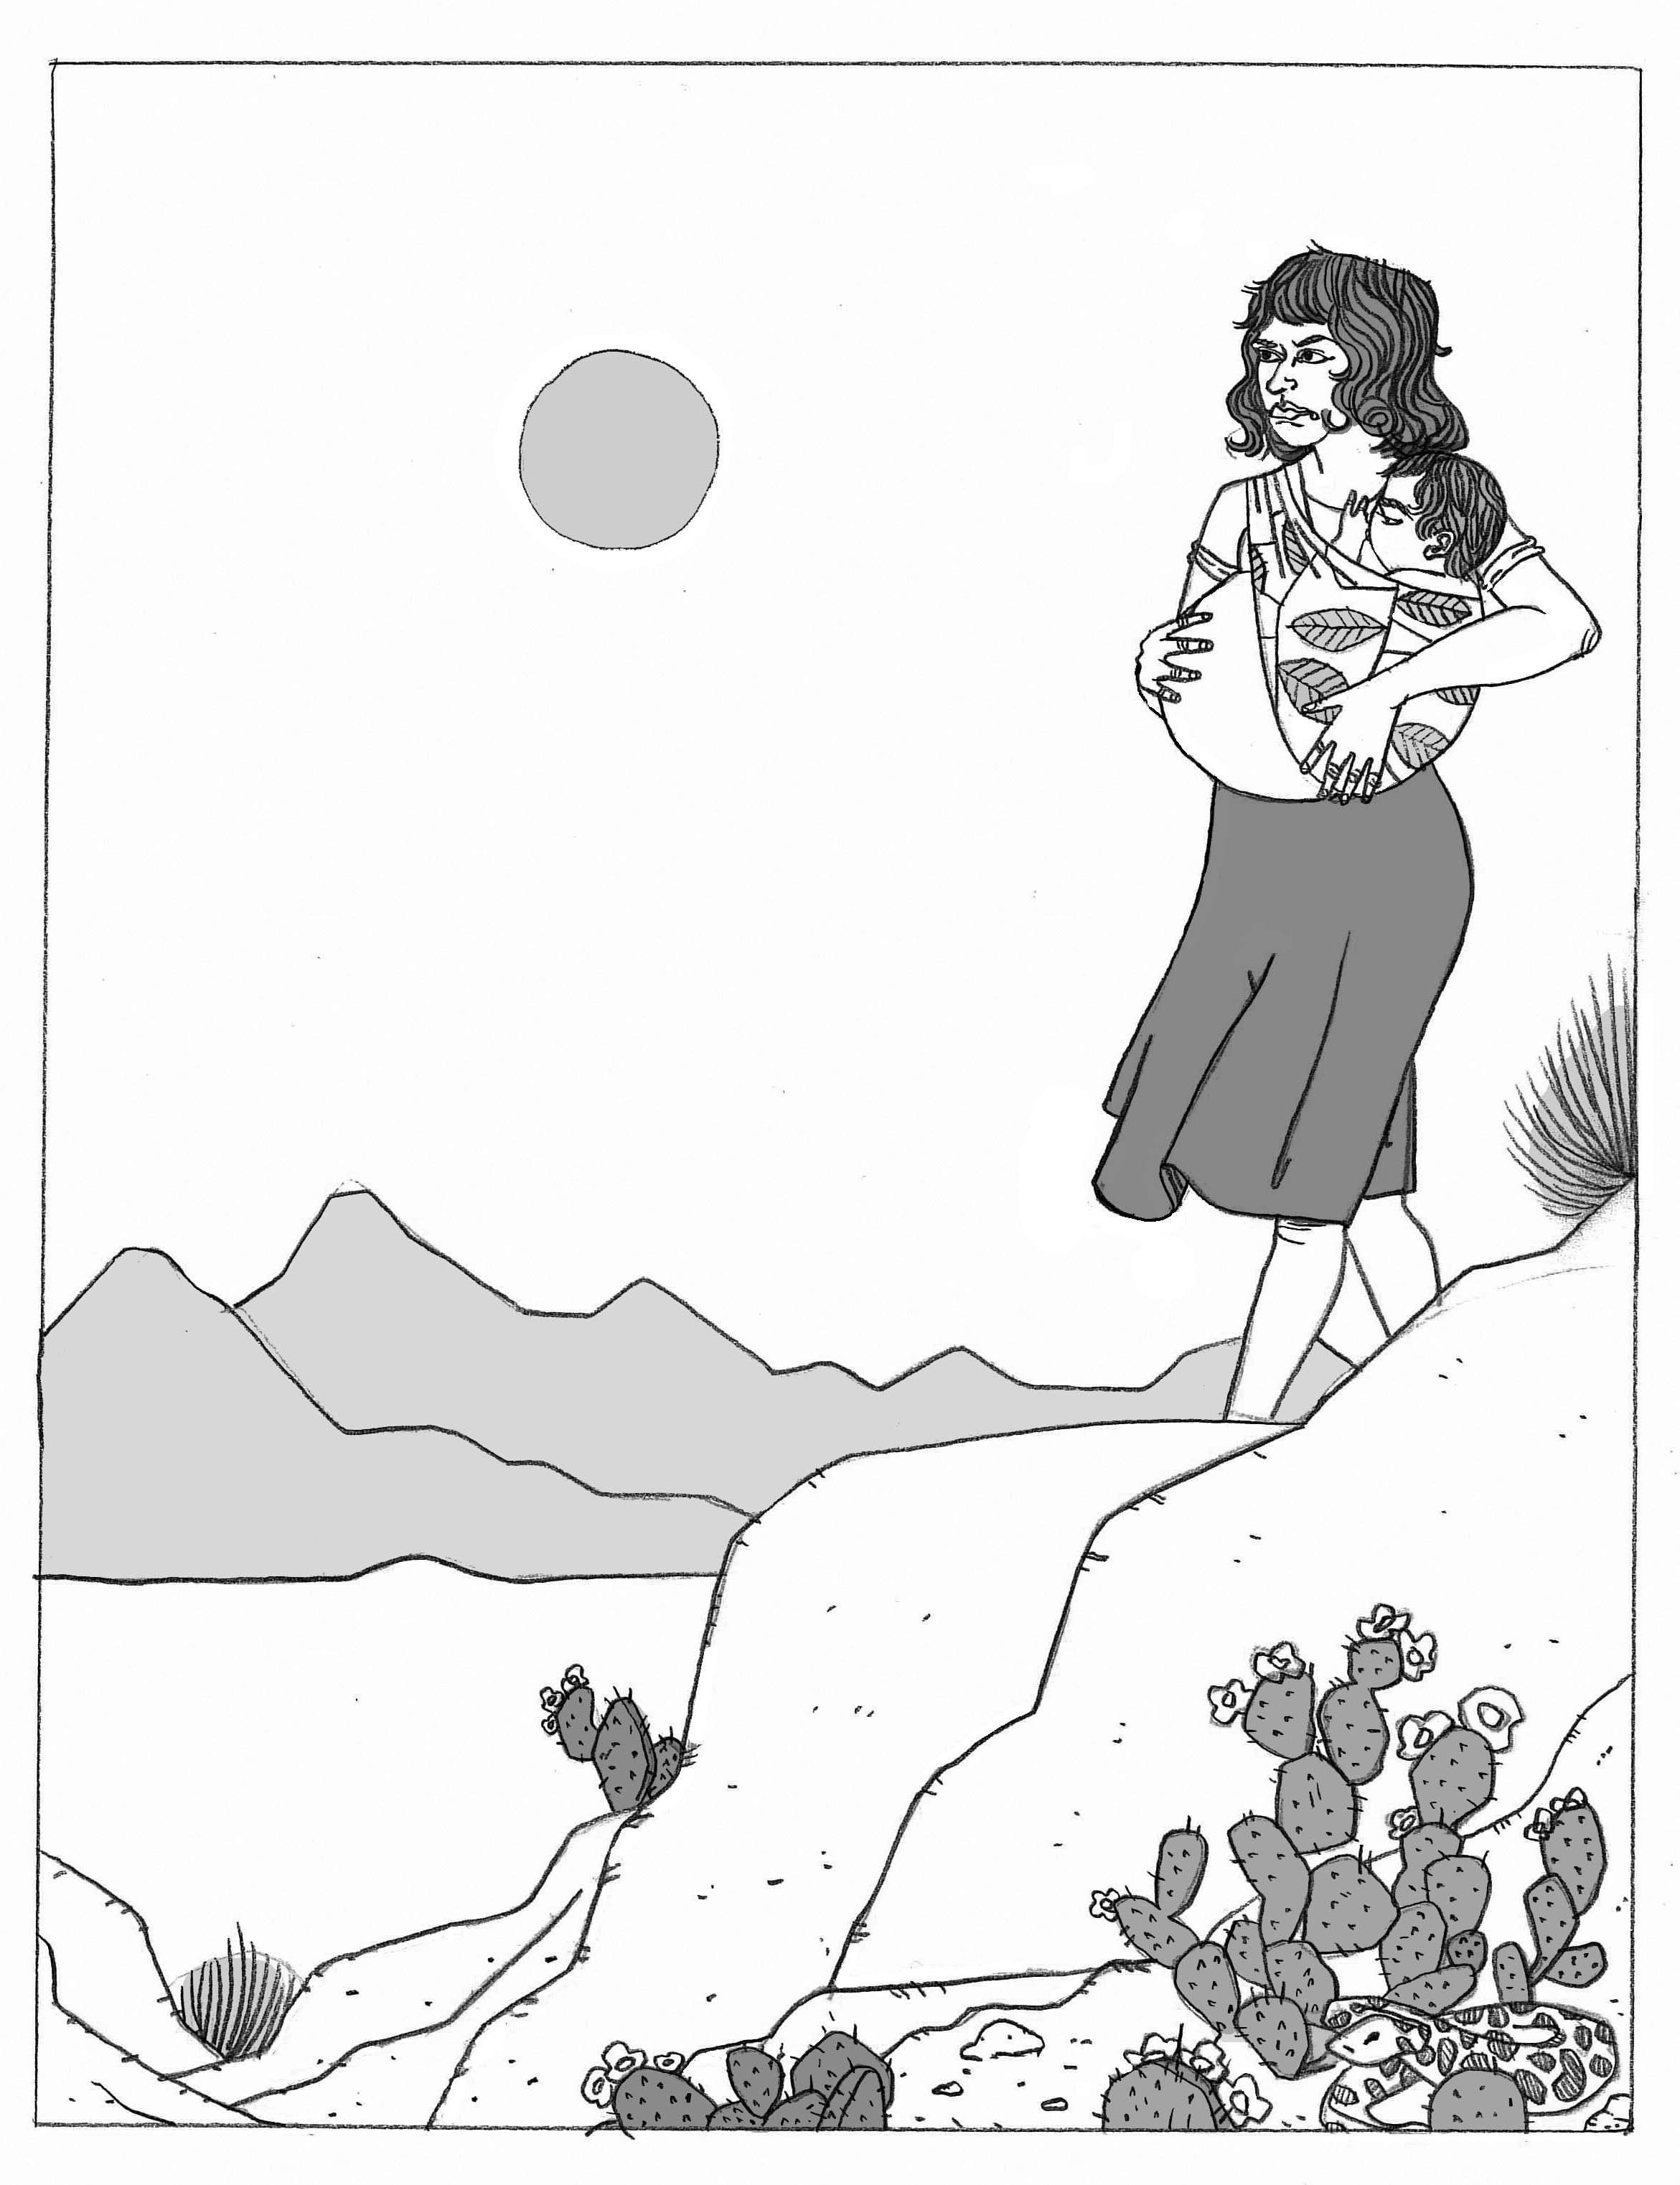 Illustration by Bonaia Rosado